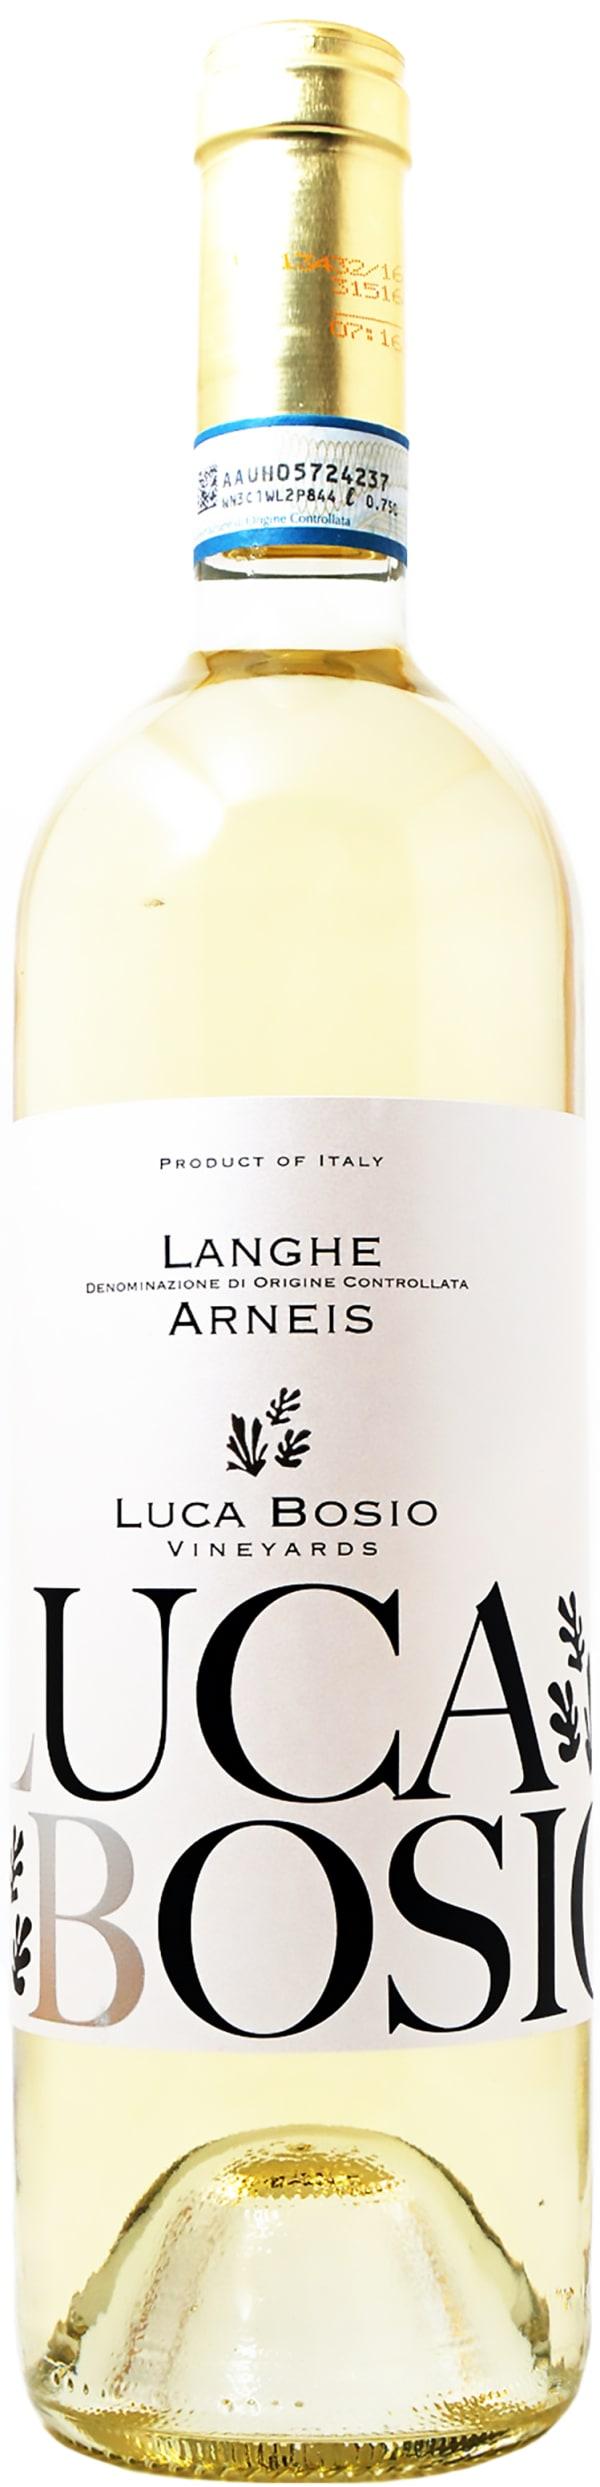 Luca Bosio Langhe Arneis 2017